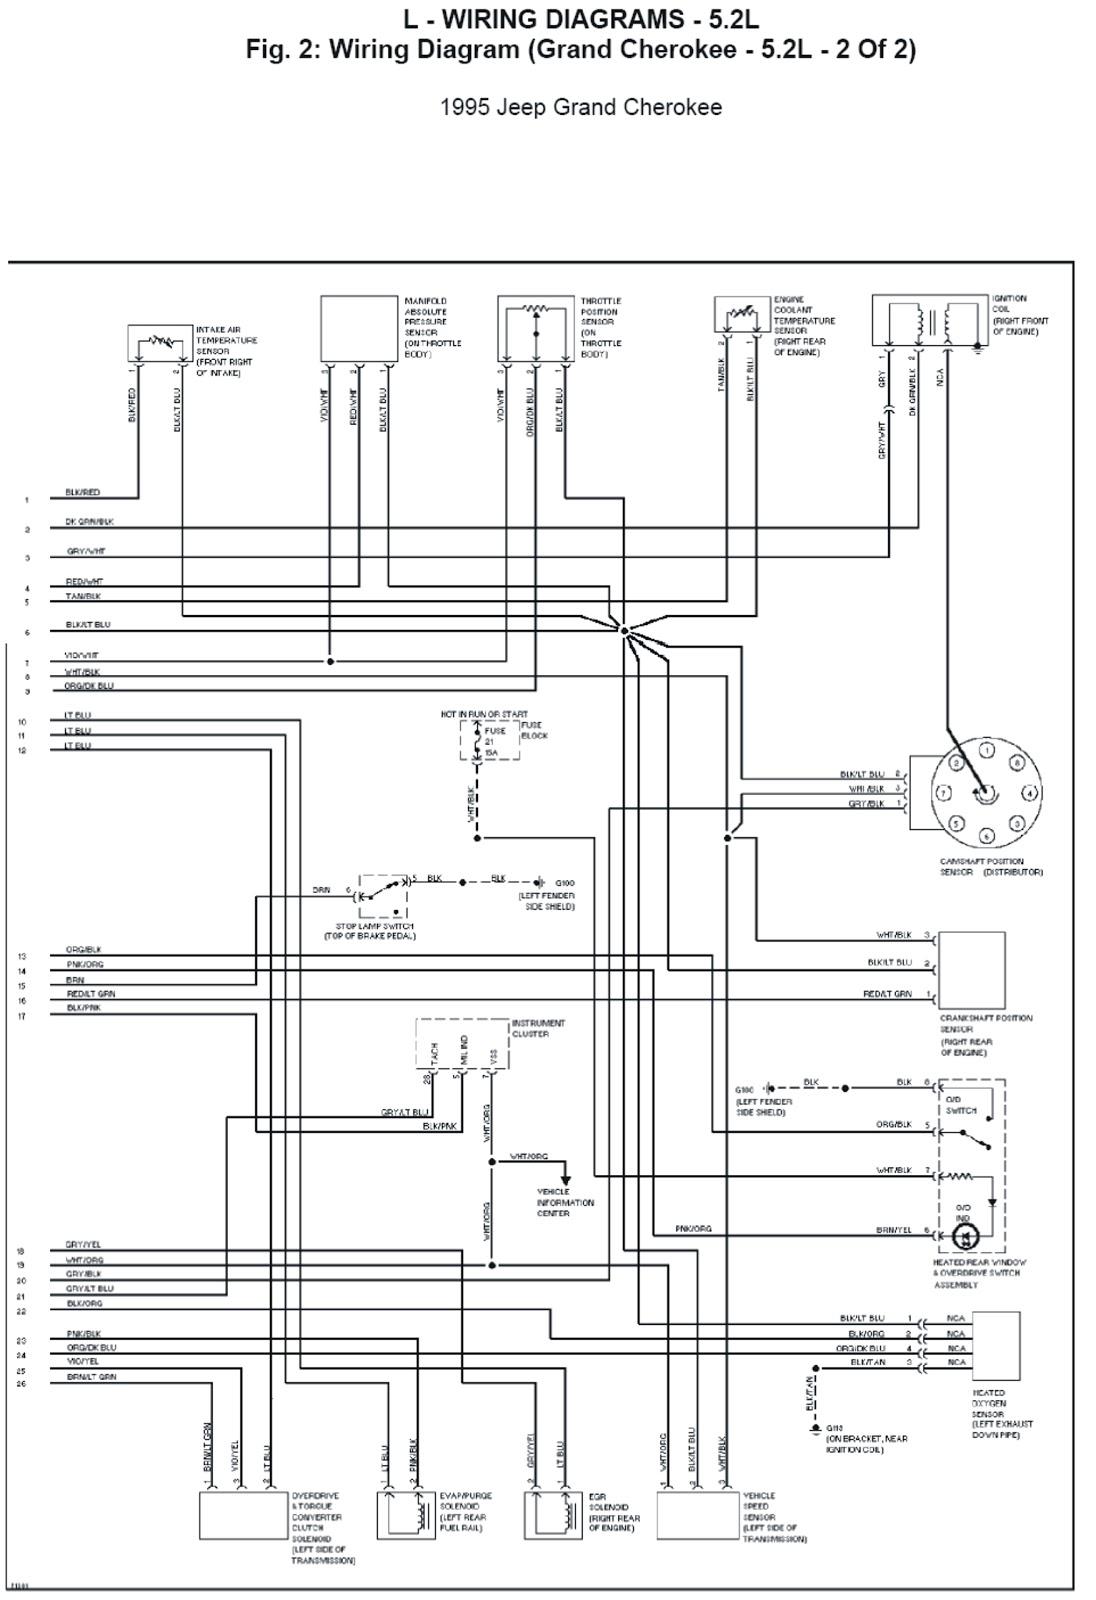 1995 Wrangler Radio Wiring Diagram Schematic | Wiring Diagram on 1997 jeep grand cherokee wiring diagram, 1997 jeep cherokee starter circuit, 1997 jeep wrangler fuse box diagram, 1997 jeep wrangler parts diagram, 1997 jeep wrangler brake diagram, 1978 jeep cj7 wiring-diagram, 1997 jeep wrangler engine diagram, 1997 jeep wrangler fuel pump relay diagram,